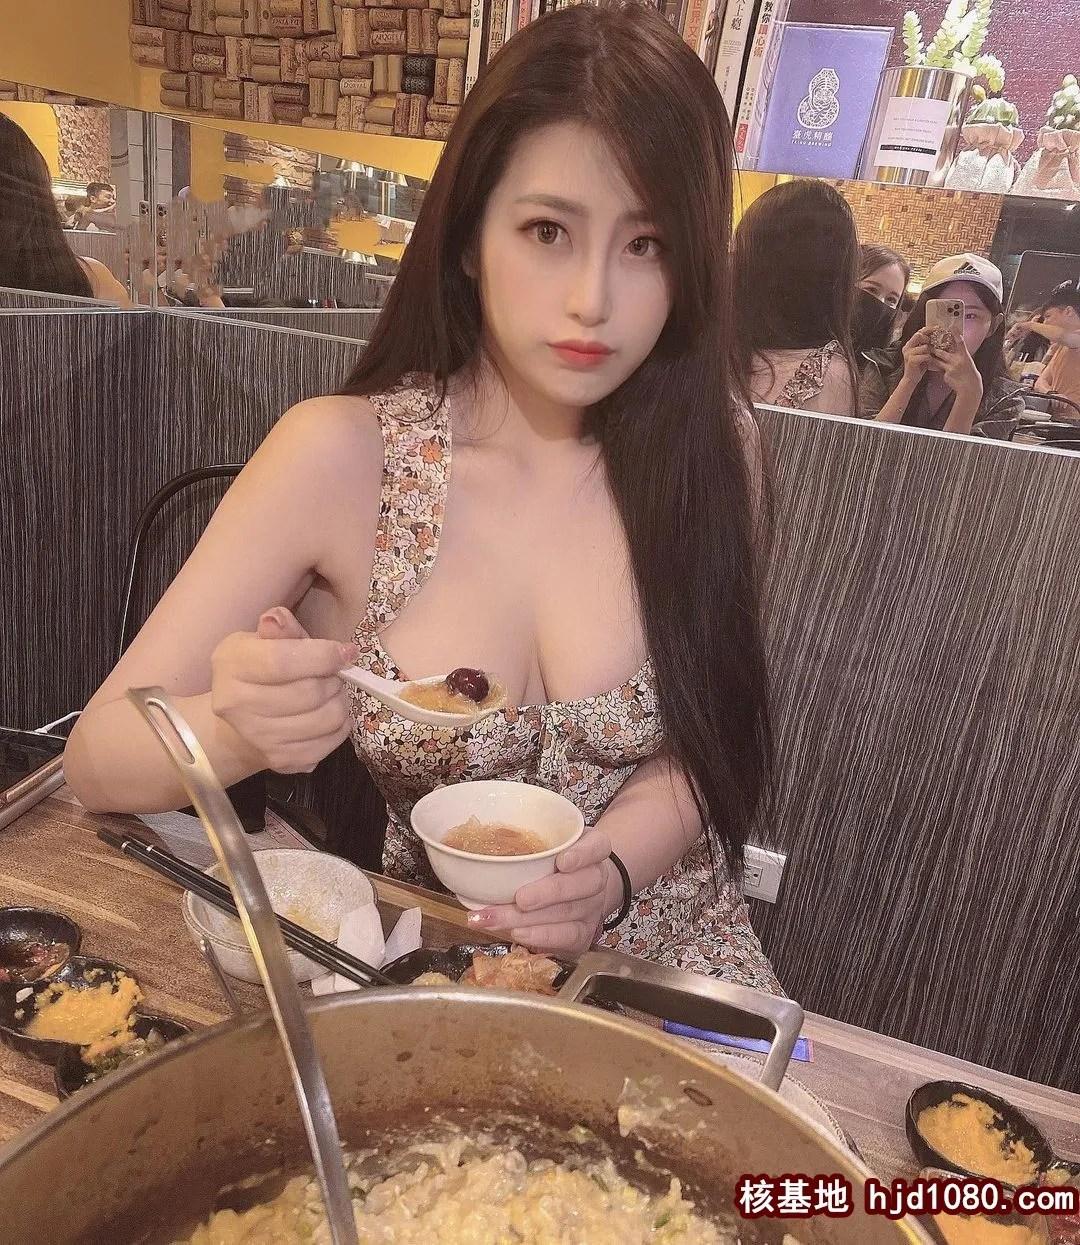 Yumi.k「乳量100%飽滿」奶香四溢-小柚妹站